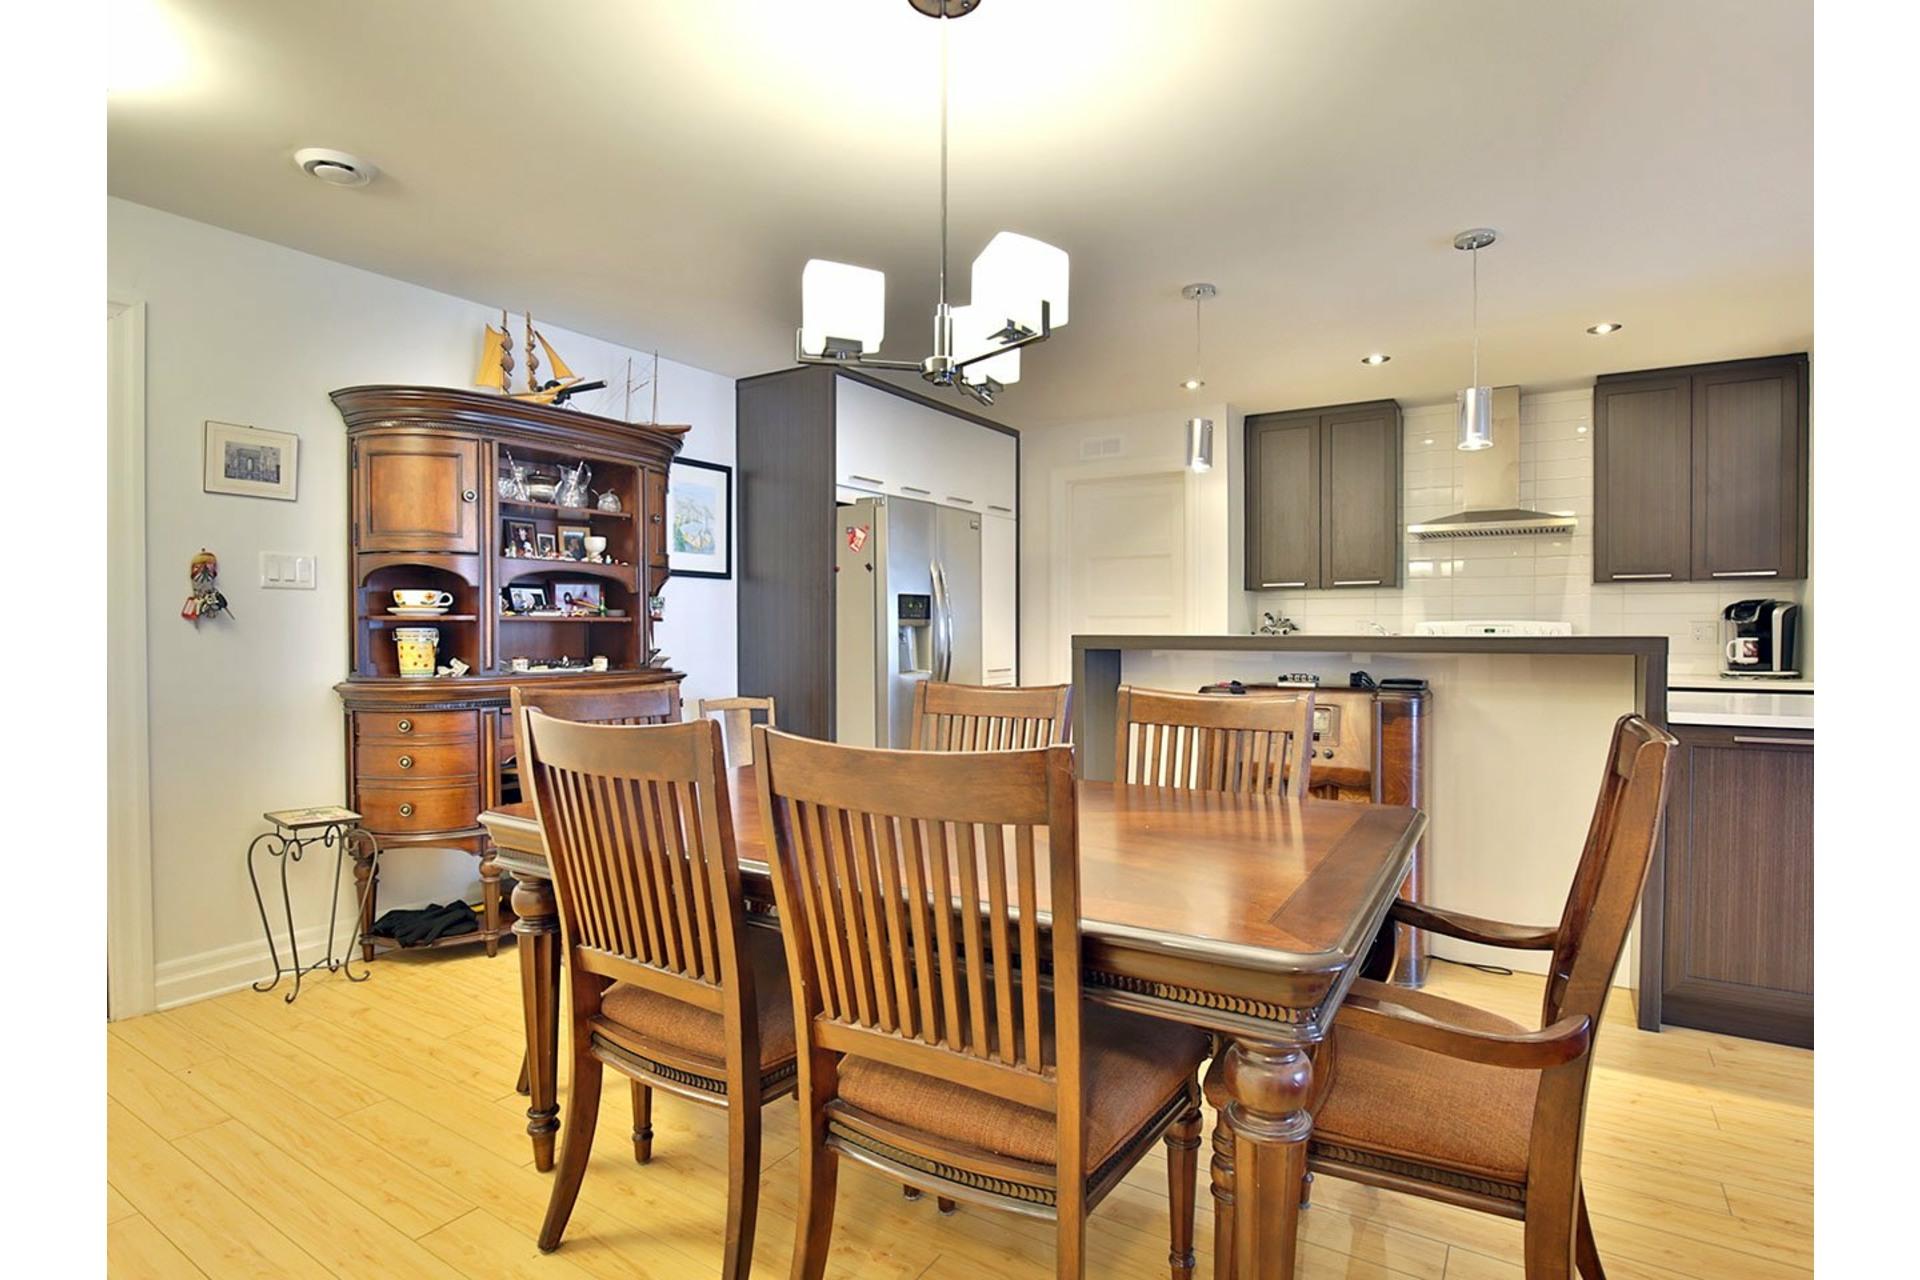 image 2 - Apartment For sale Varennes - 5 rooms